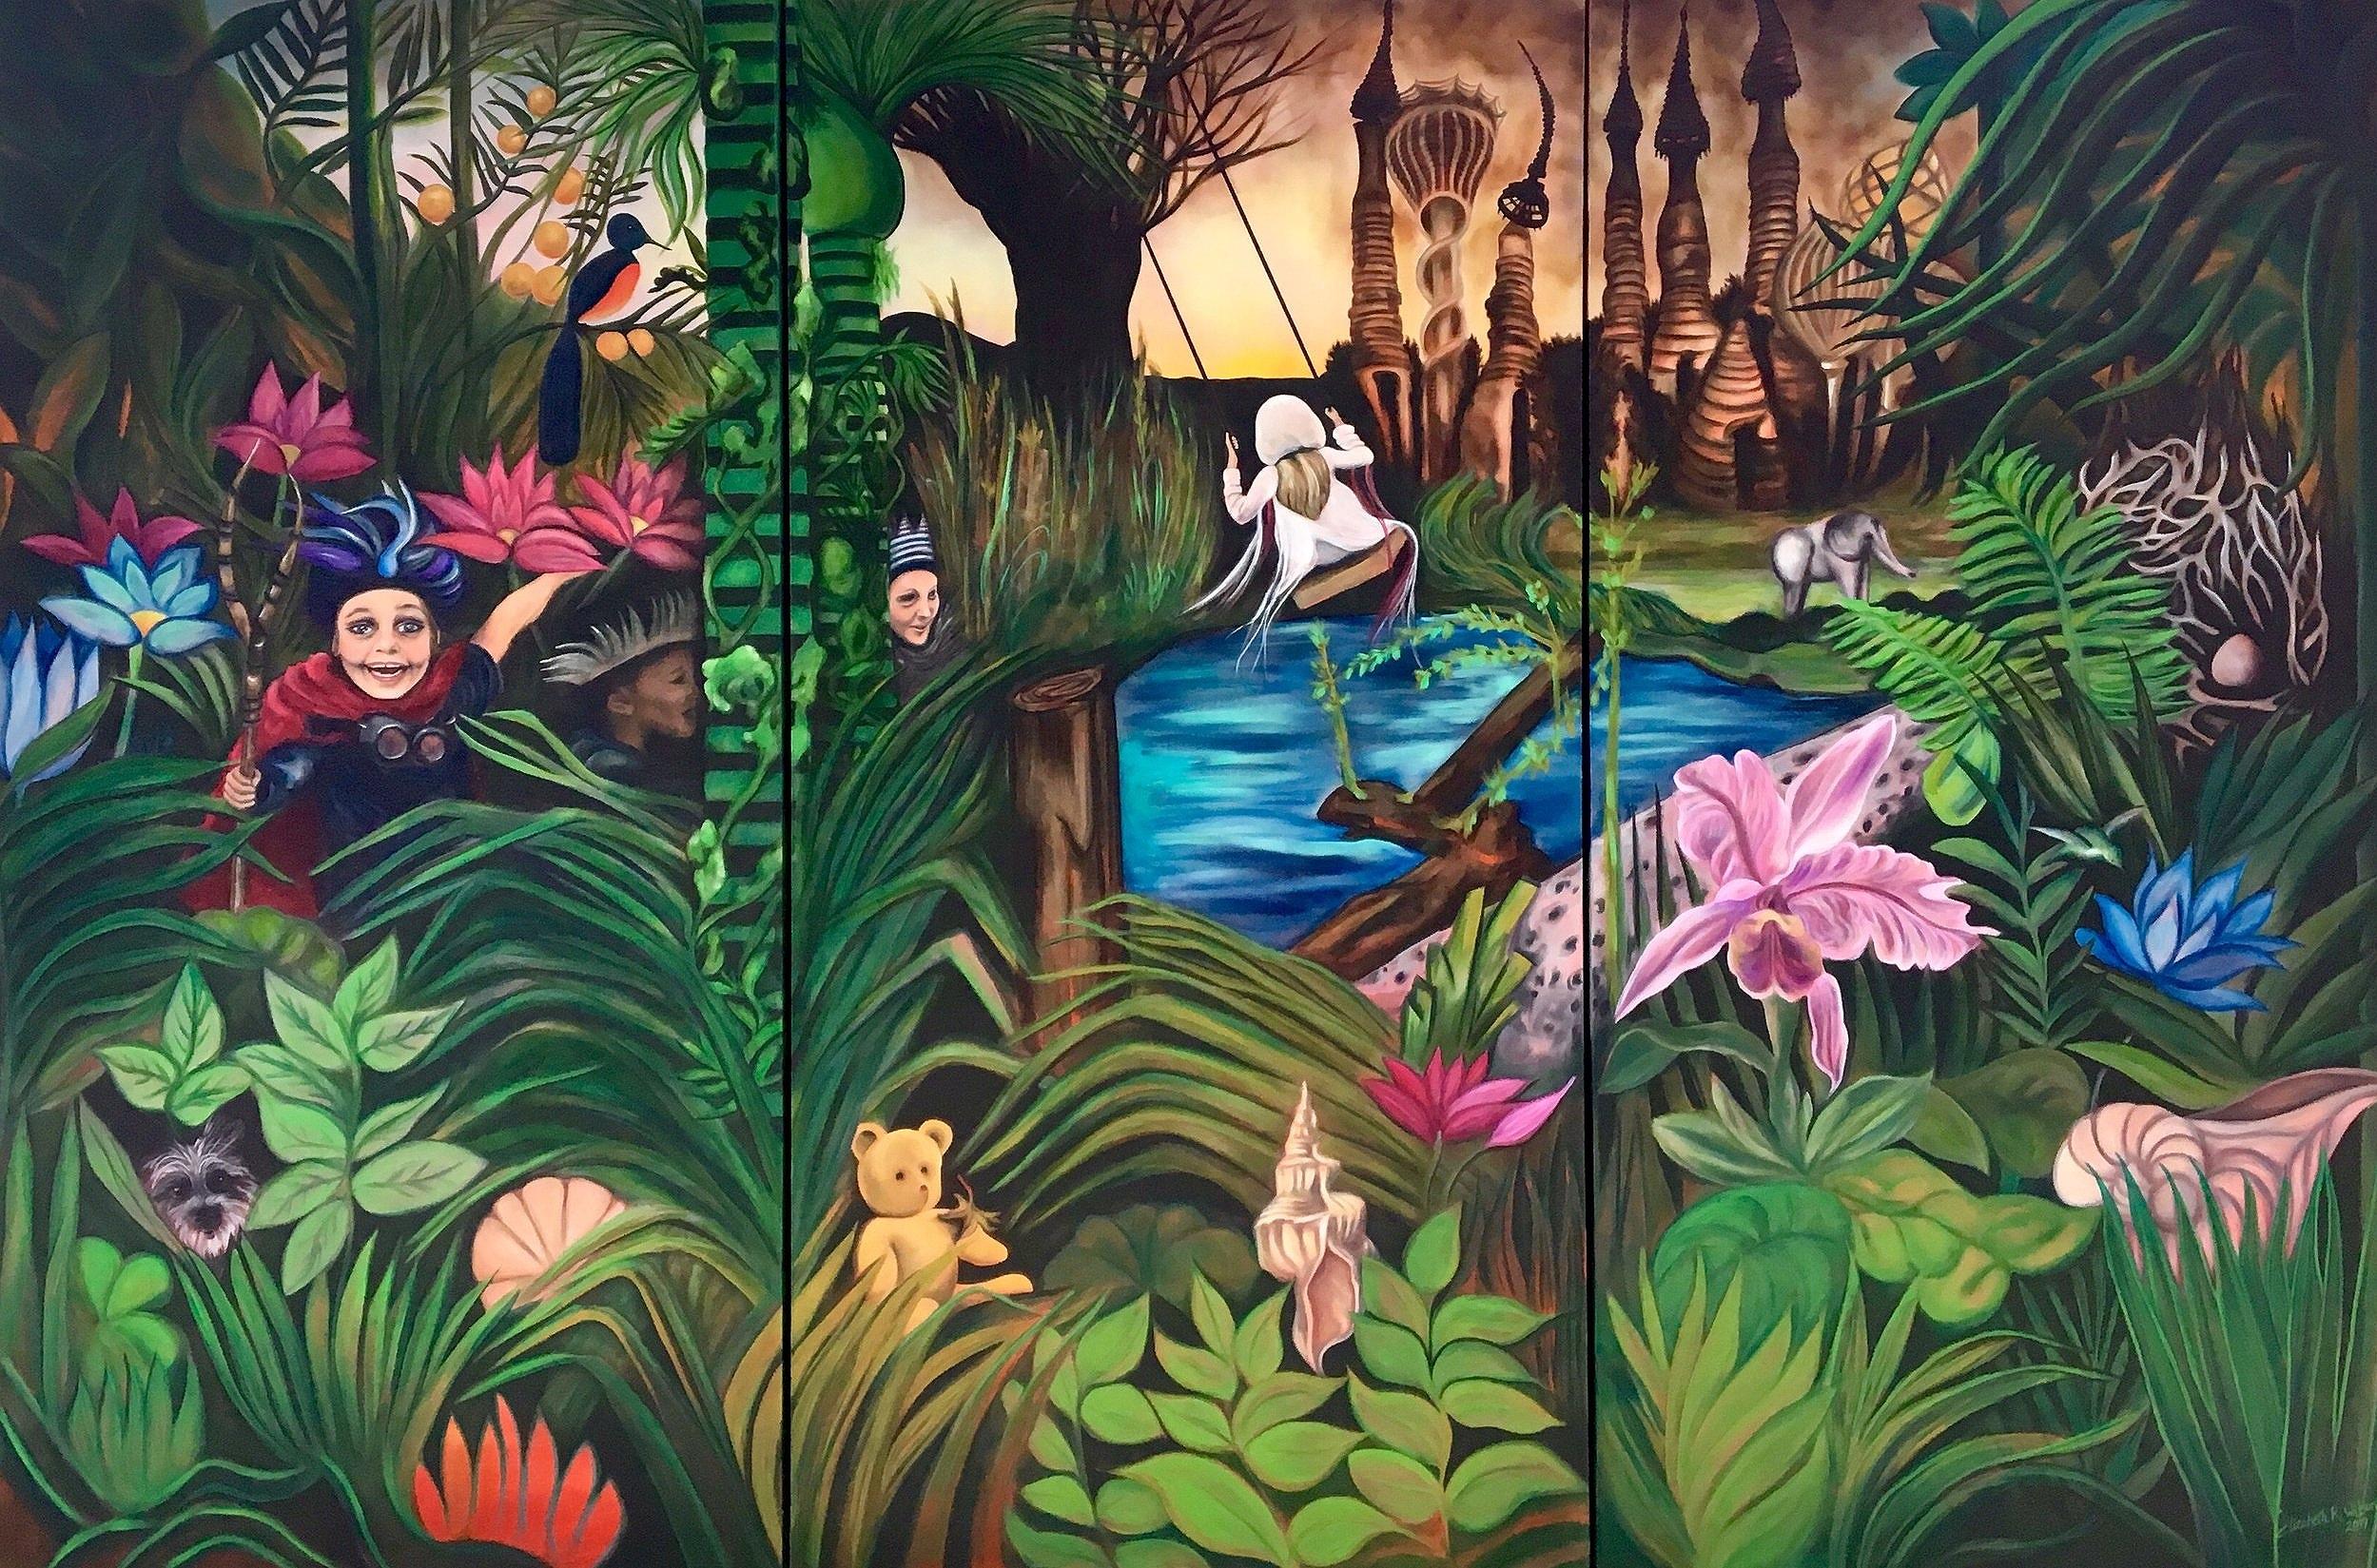 'Rewilding,' by Elizabeth R. Wilson, 2019. Oil on Canvas, Triptych 9 x 6 ft